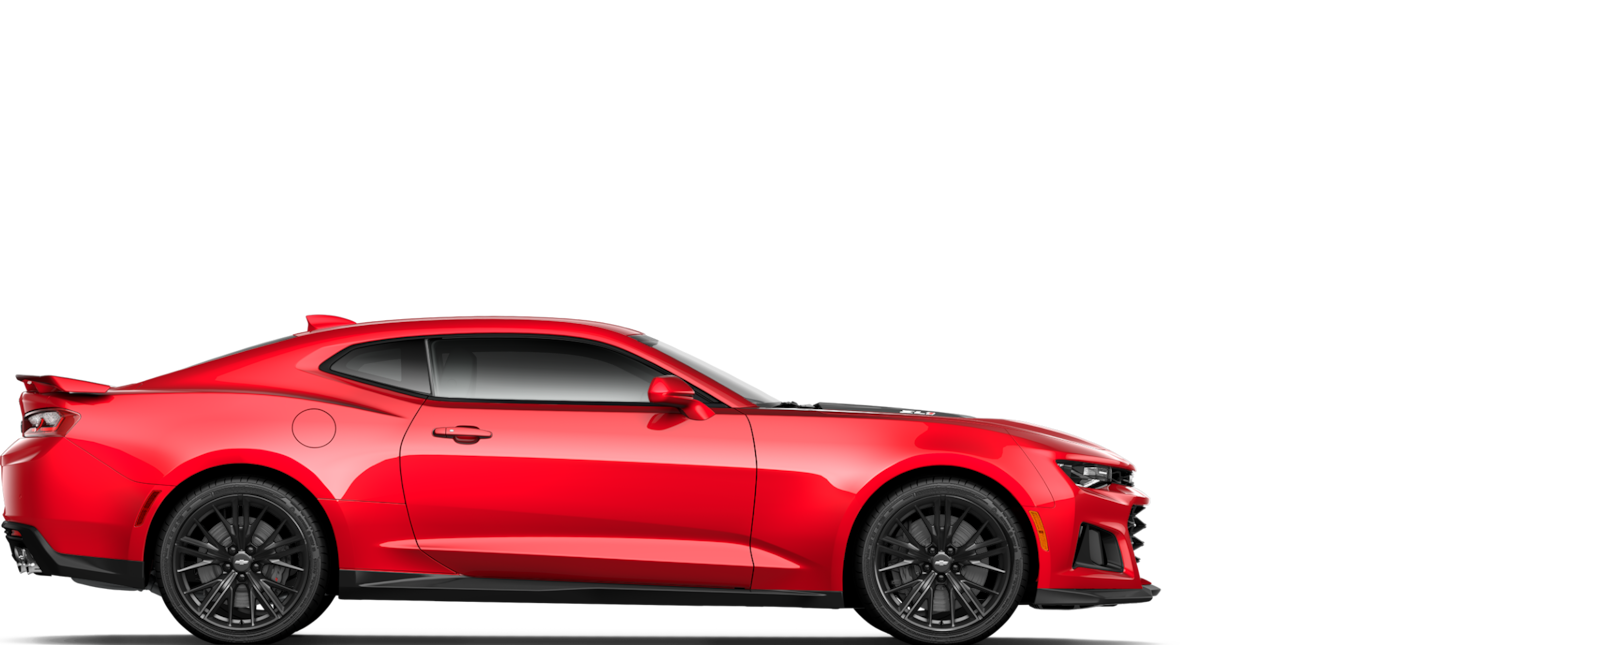 2014 zl1 camaro recaro seats html 2017 2018 cars reviews - 2014 Zl1 Camaro Recaro Seats Html 2017 2018 Cars Reviews 66